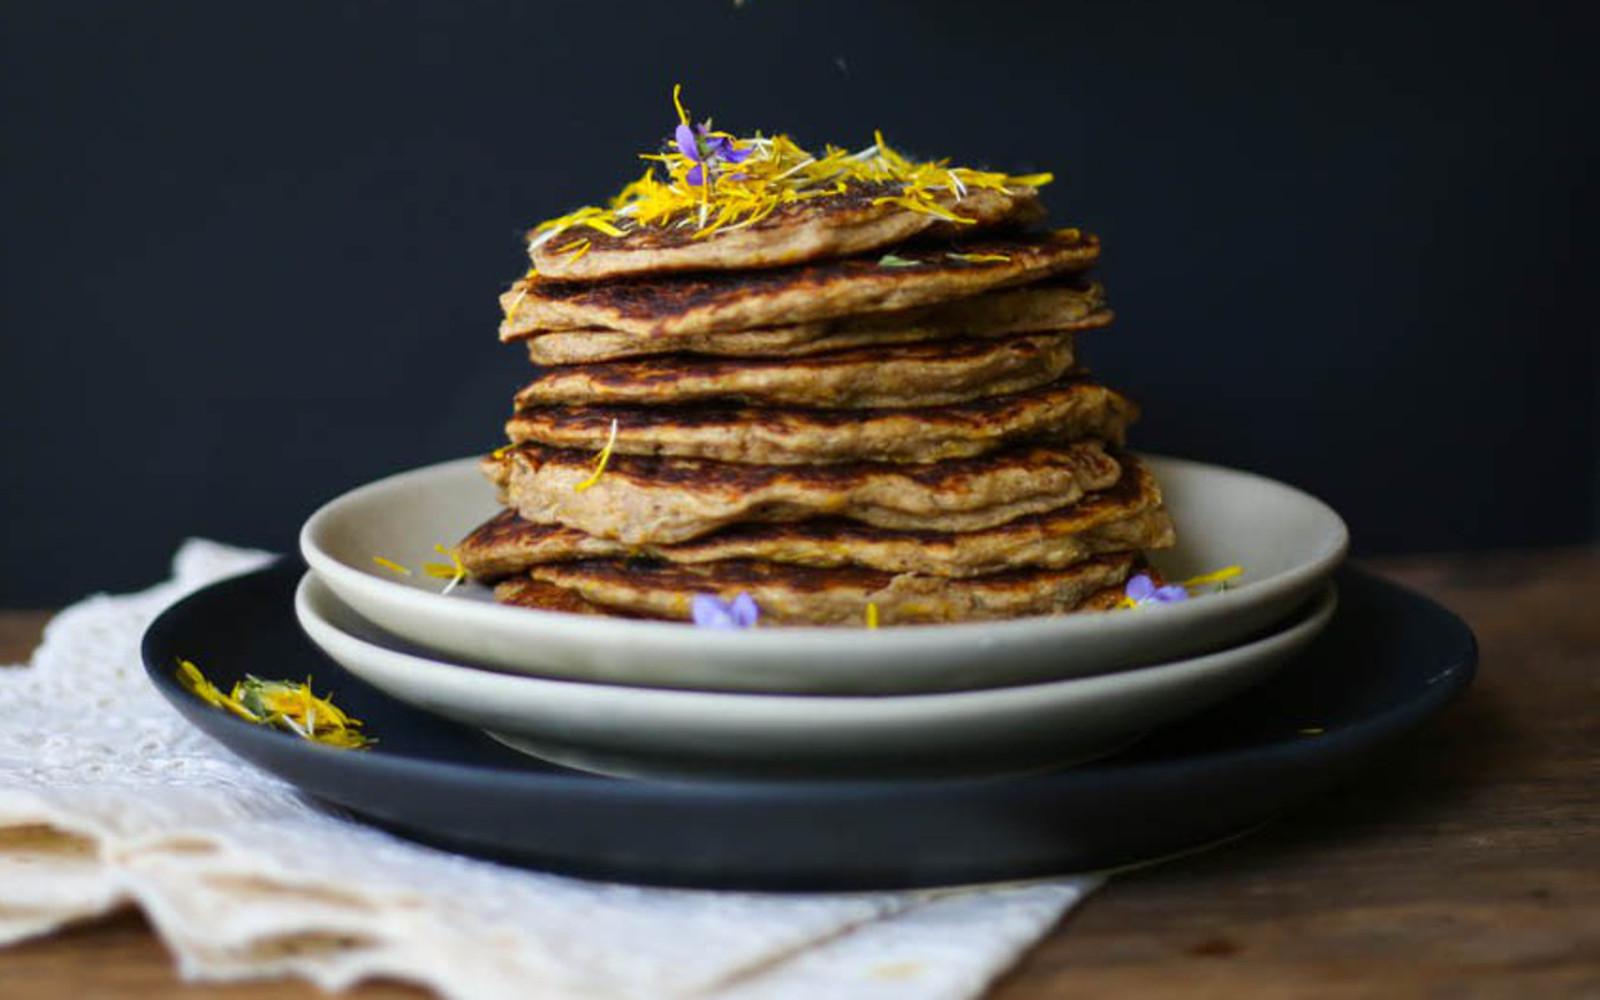 Banana Dandelion Pancakes